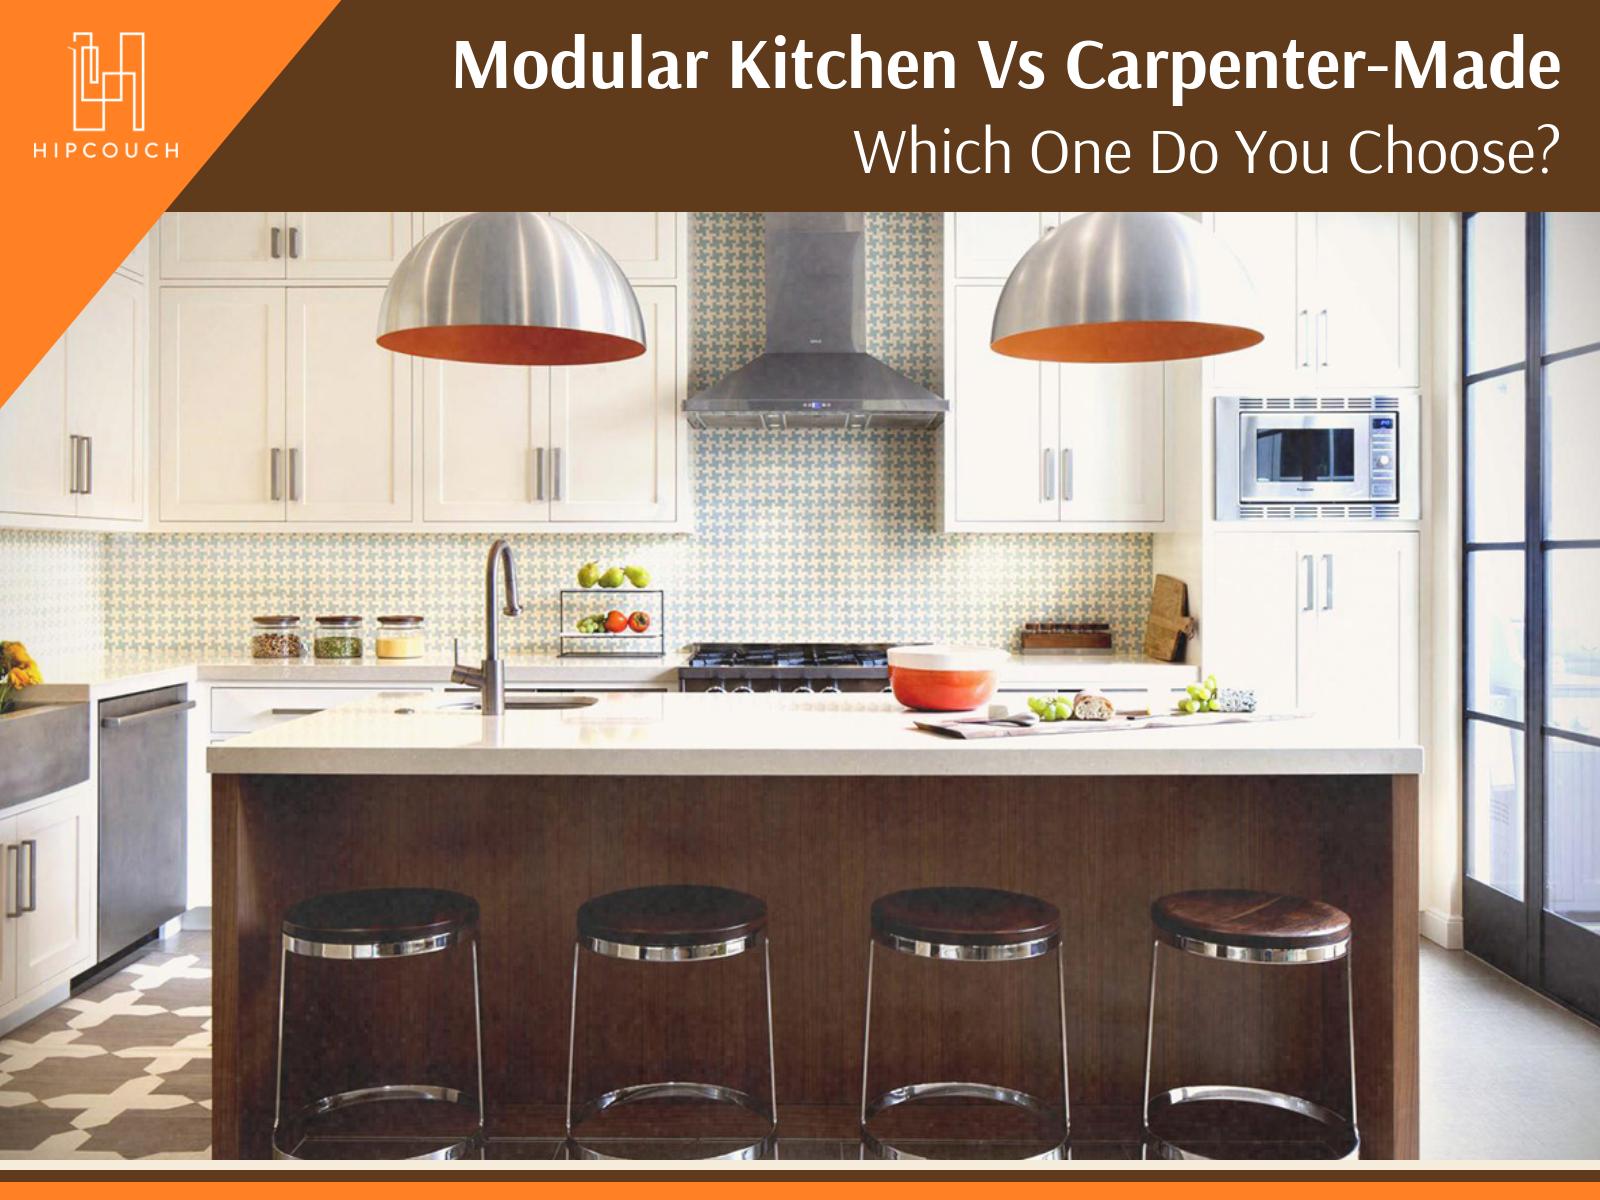 Modular Kitchen Vs Carpenter-Made Kitchen - Which One Do You Choose?